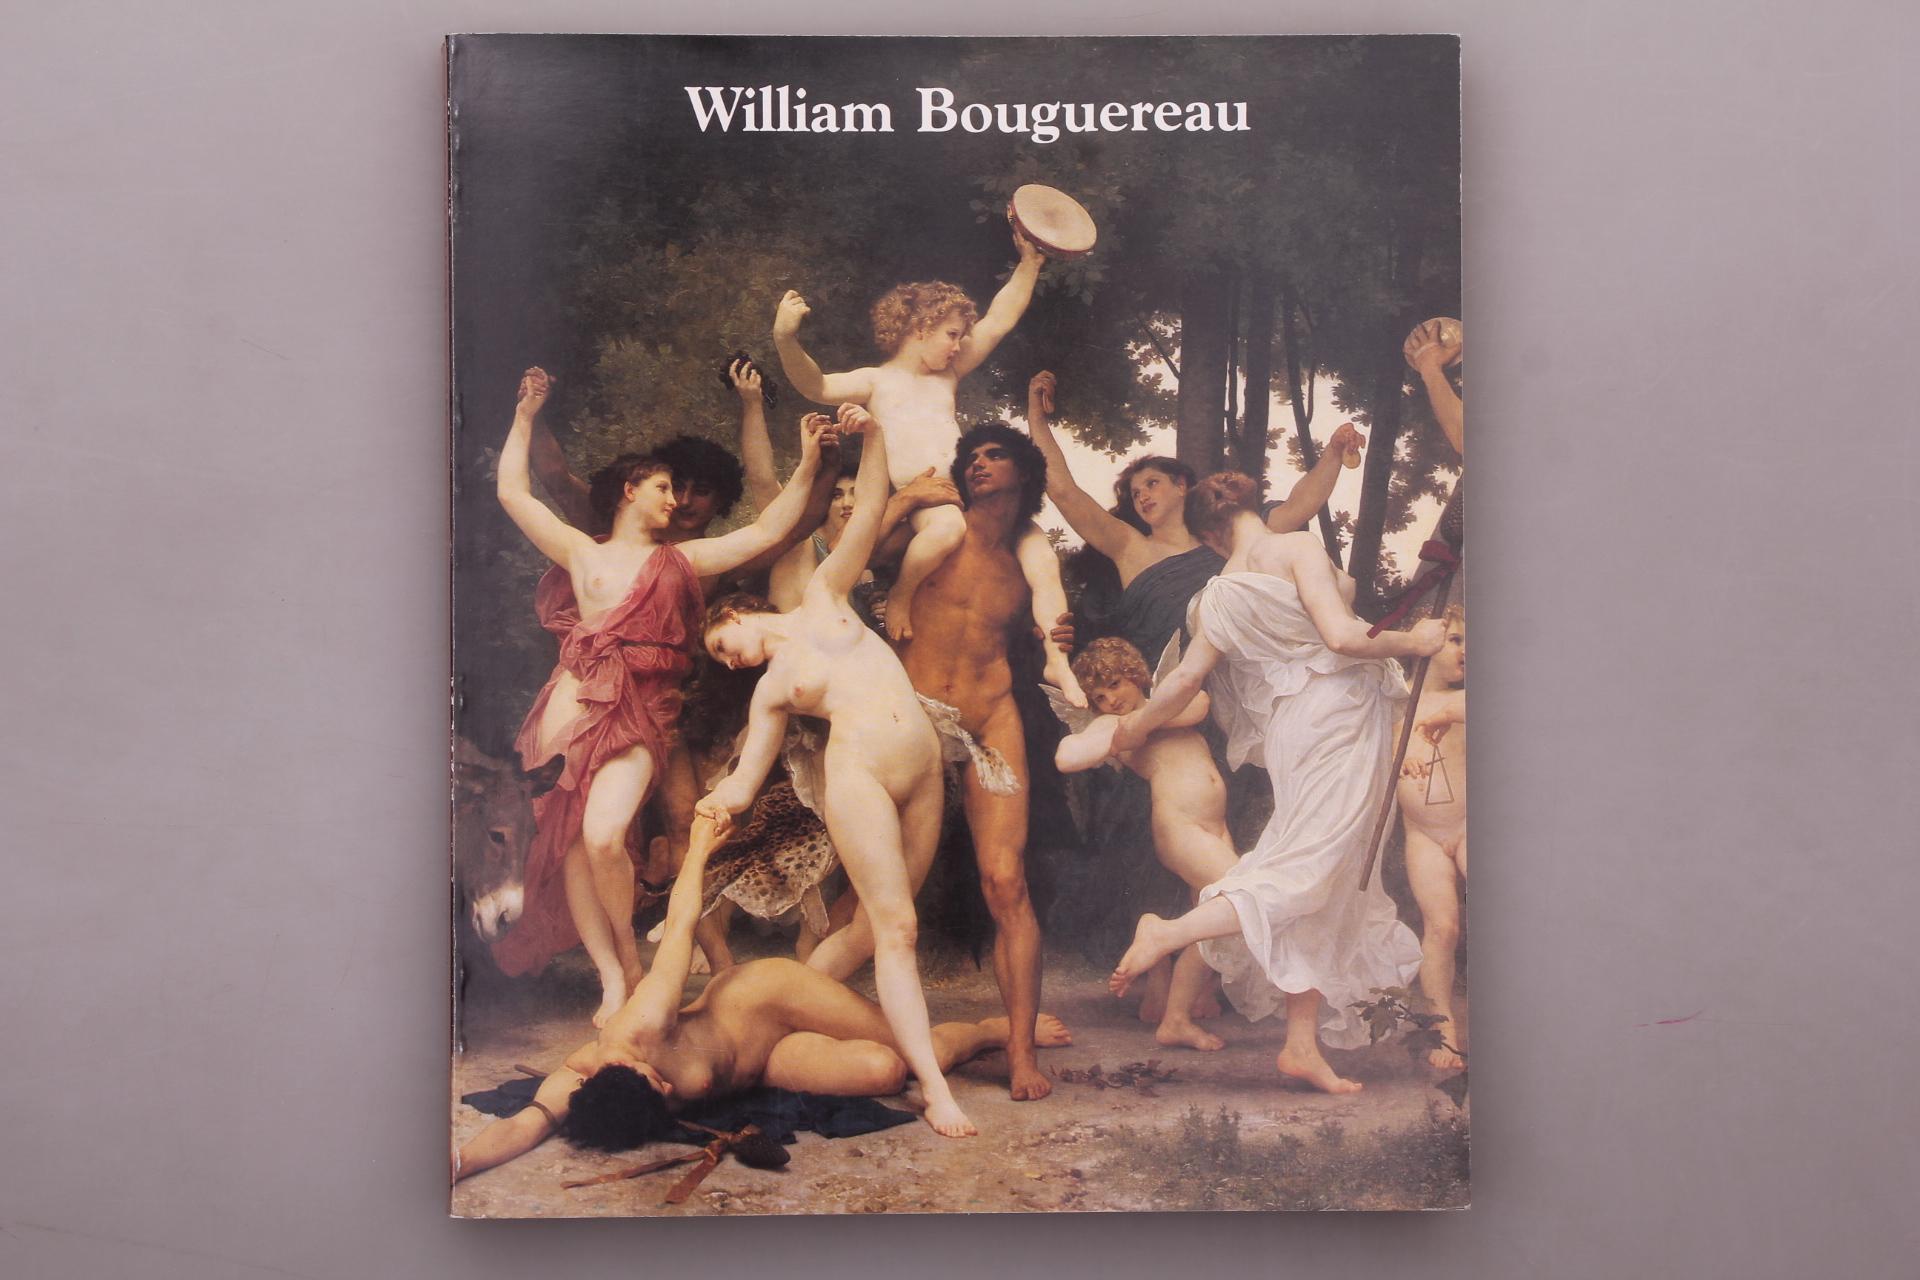 WILLIAM BOUGUEREAU 1825-1905